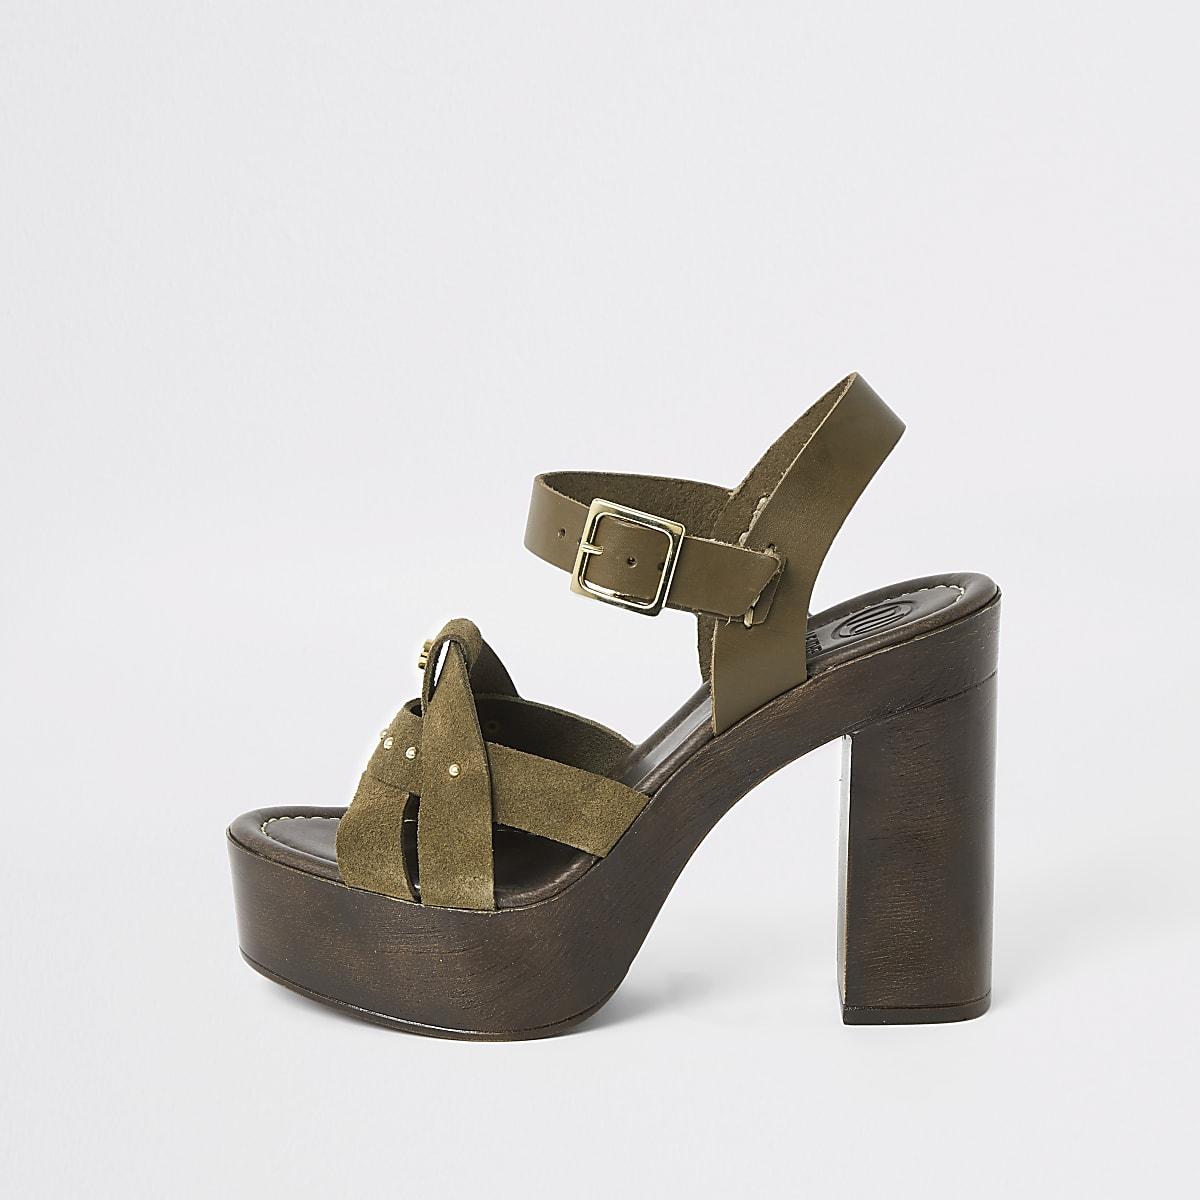 Khaki suede studded platform heels